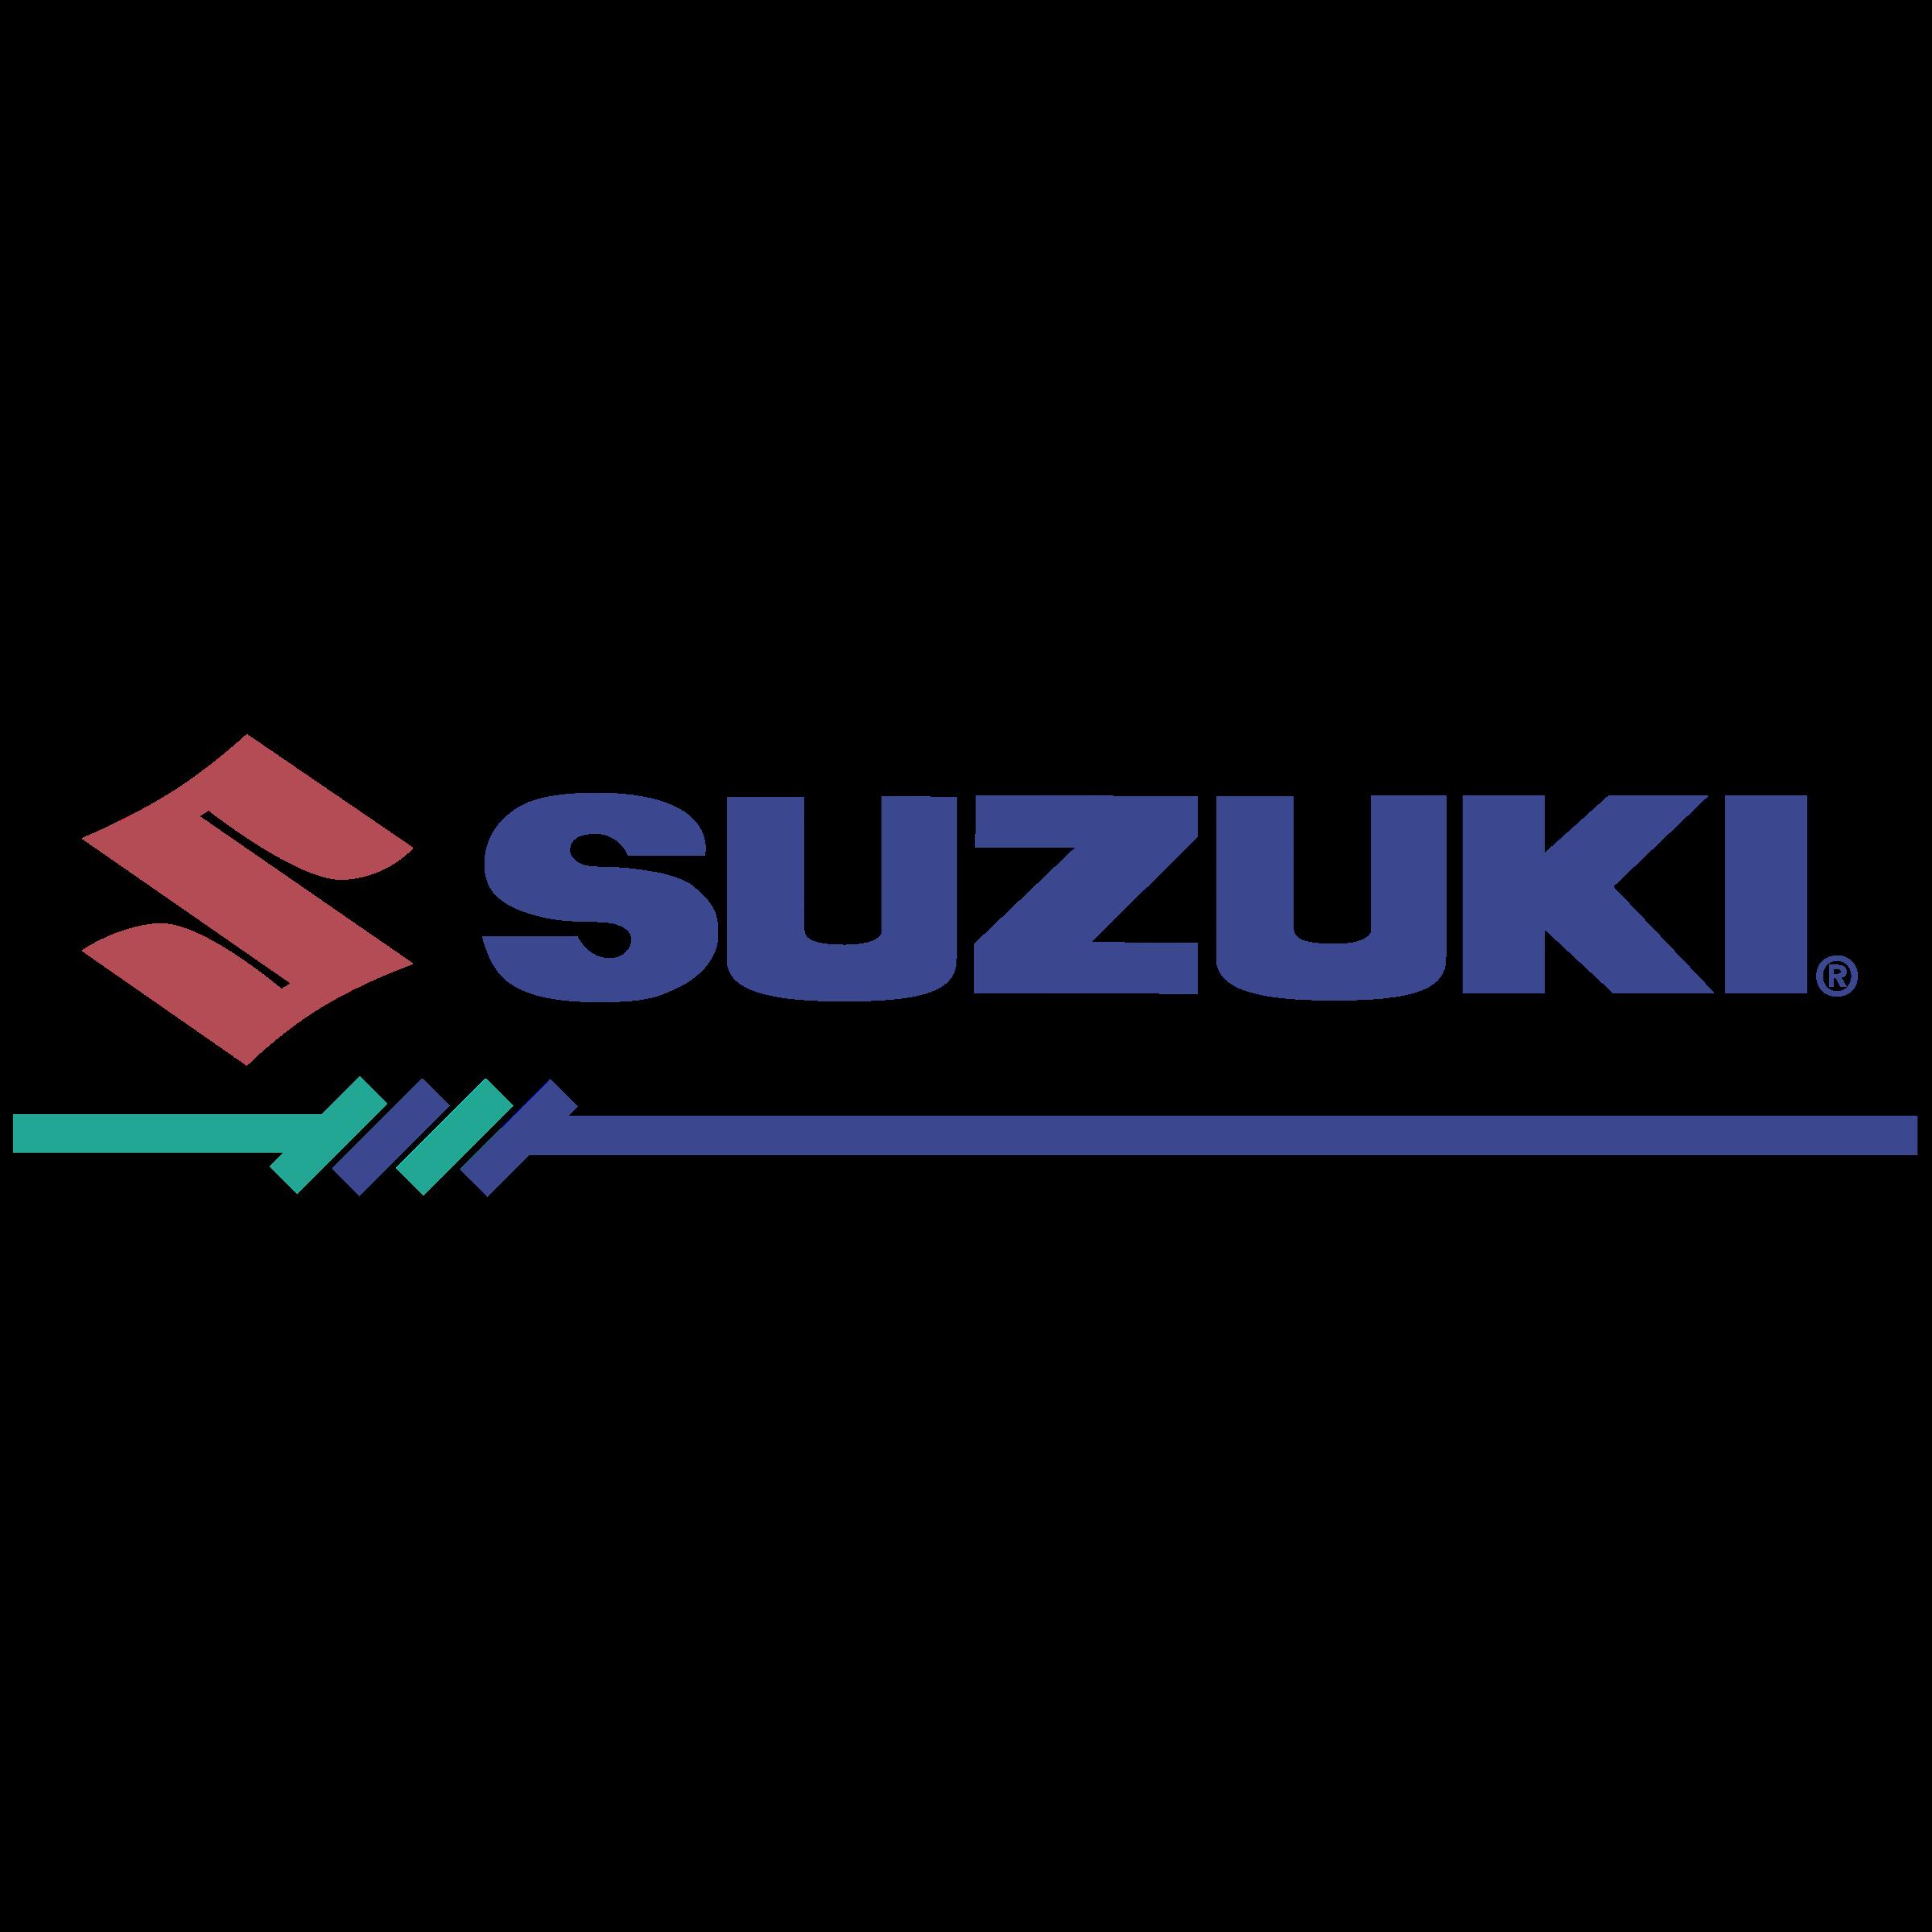 Suzuki Logo PNG Transparent